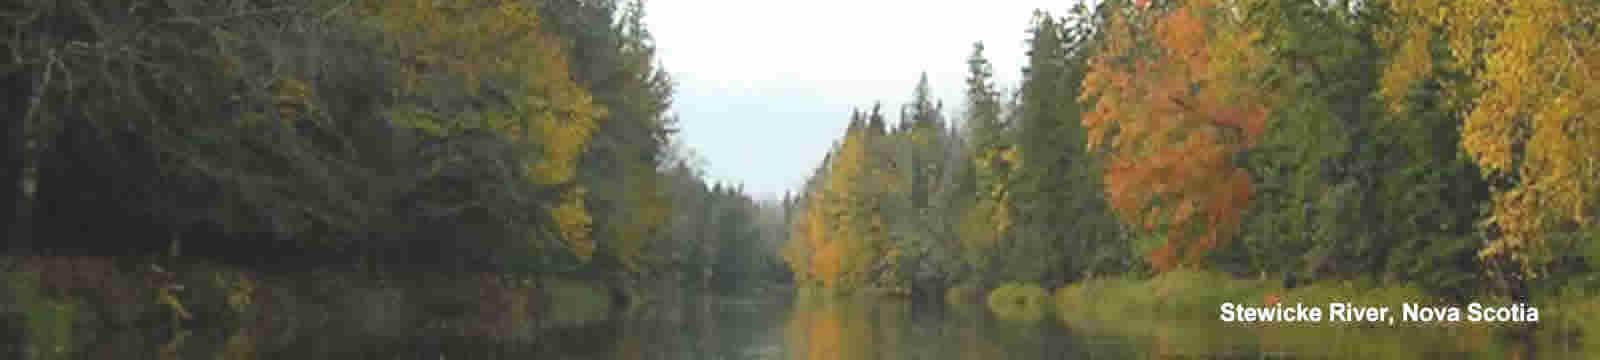 Stewicke River